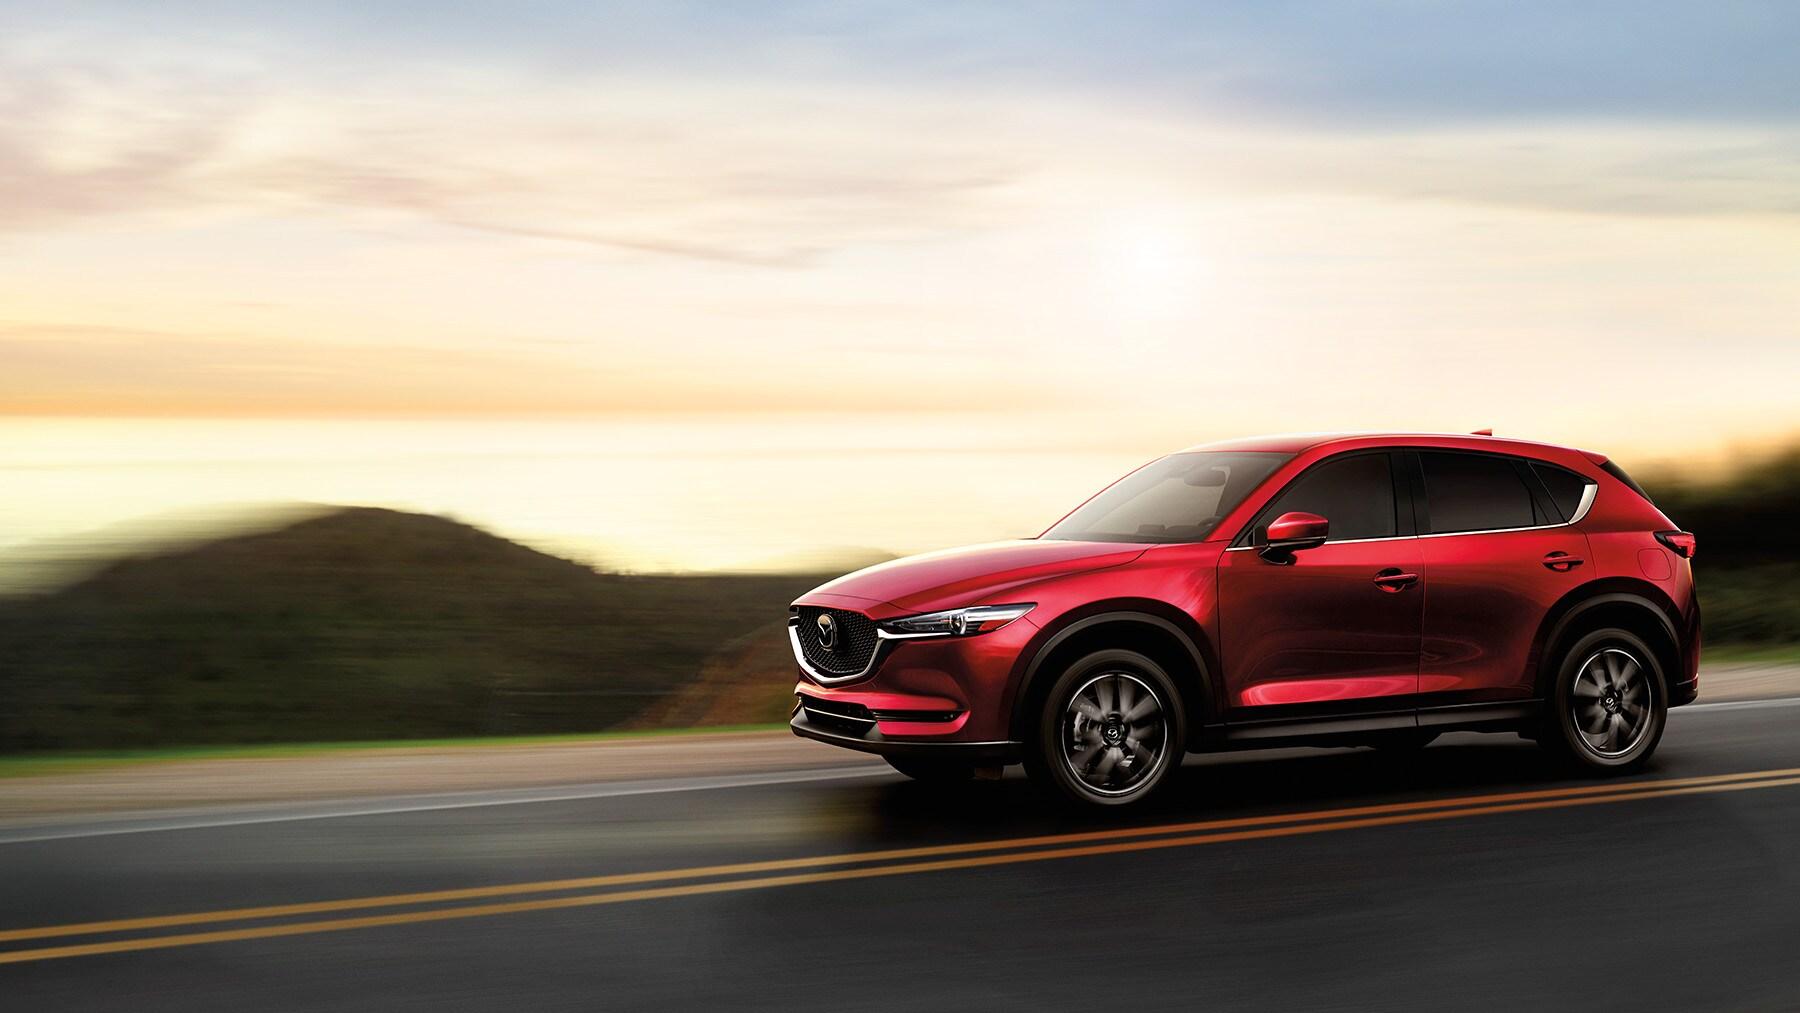 Top 5 Reasons To Buy A Mazda CX 5 (Plus 5 Bonus Reasons!)